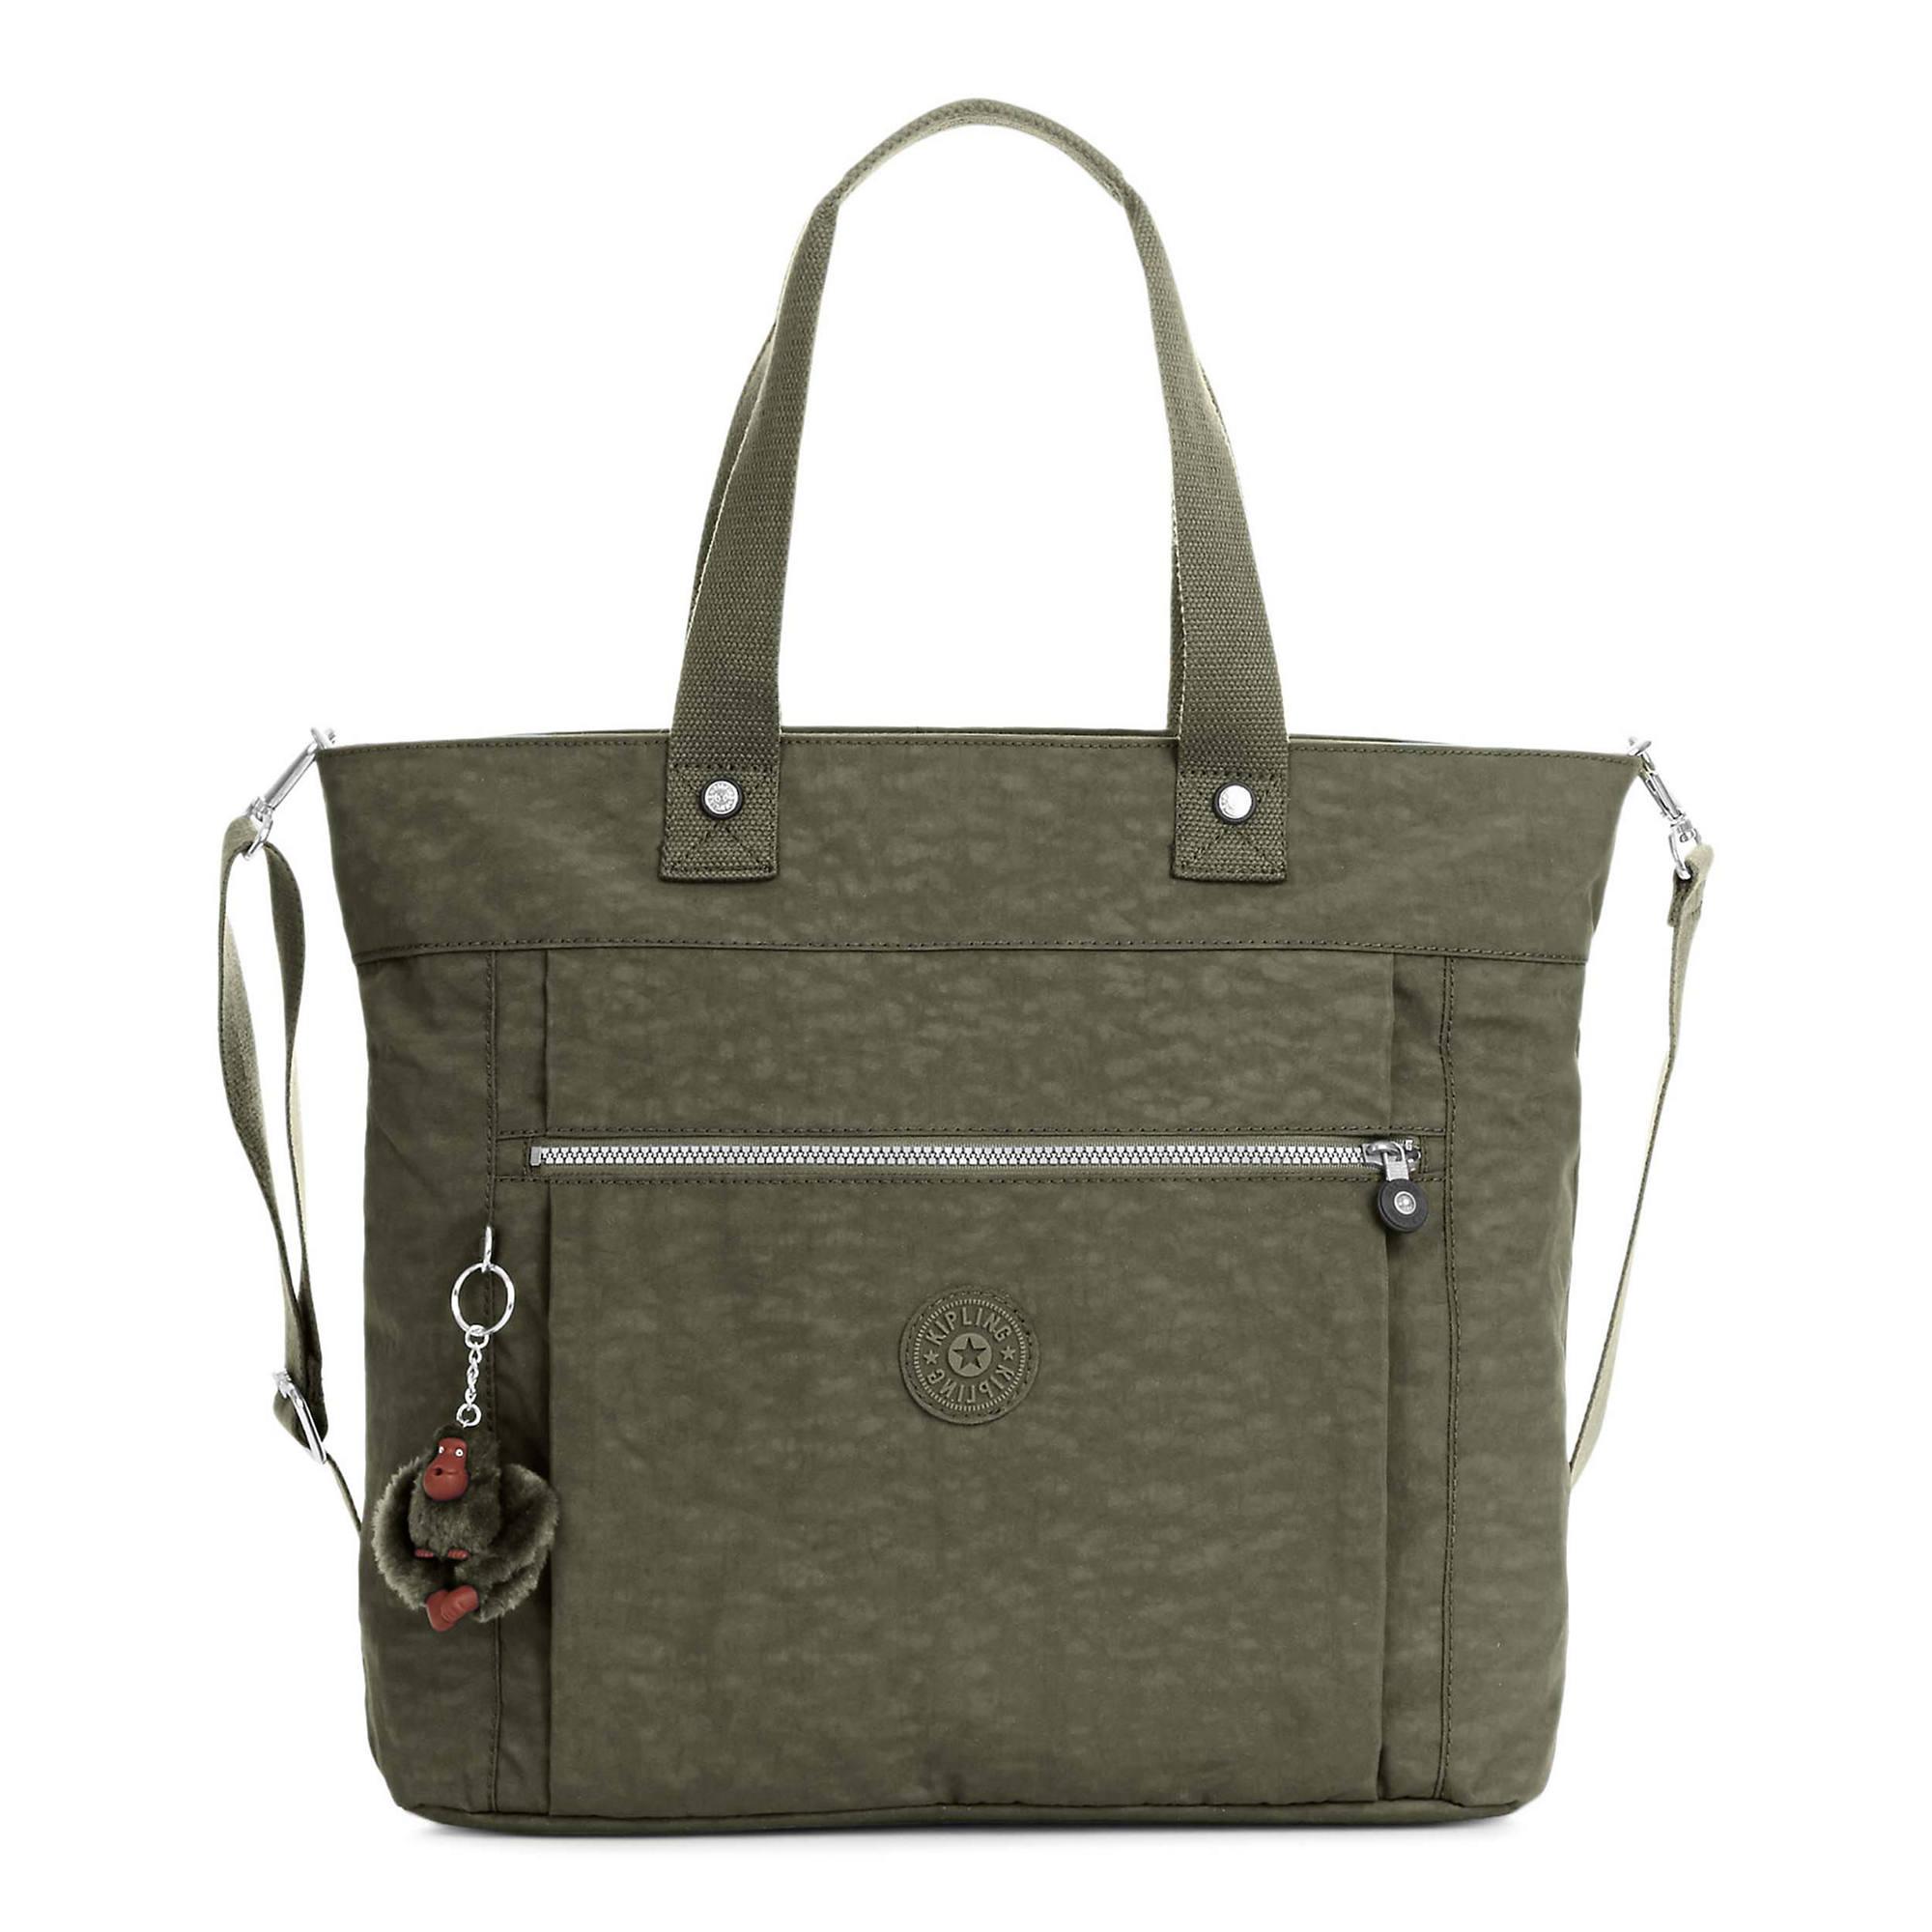 Lizzie 15 Laptop Tote Bag Jaded Green Large